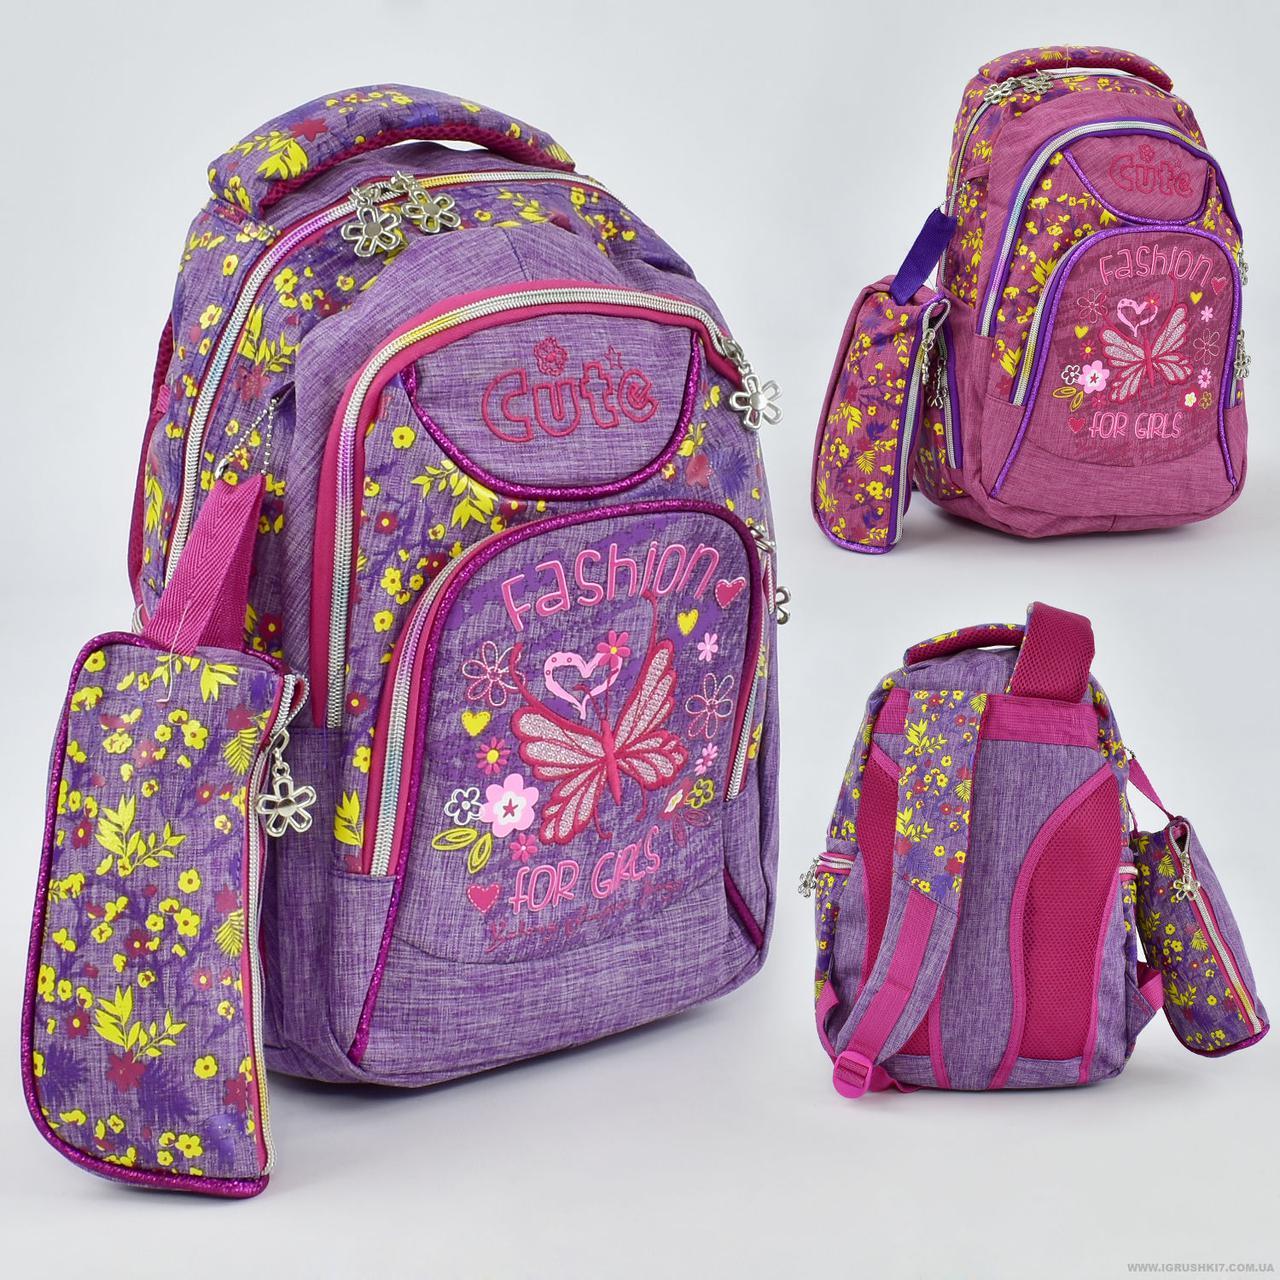 Рюкзак  Cute Fashion 2 вида, 3 отделения, 2 кармана, пенал, спинка ортопедическая